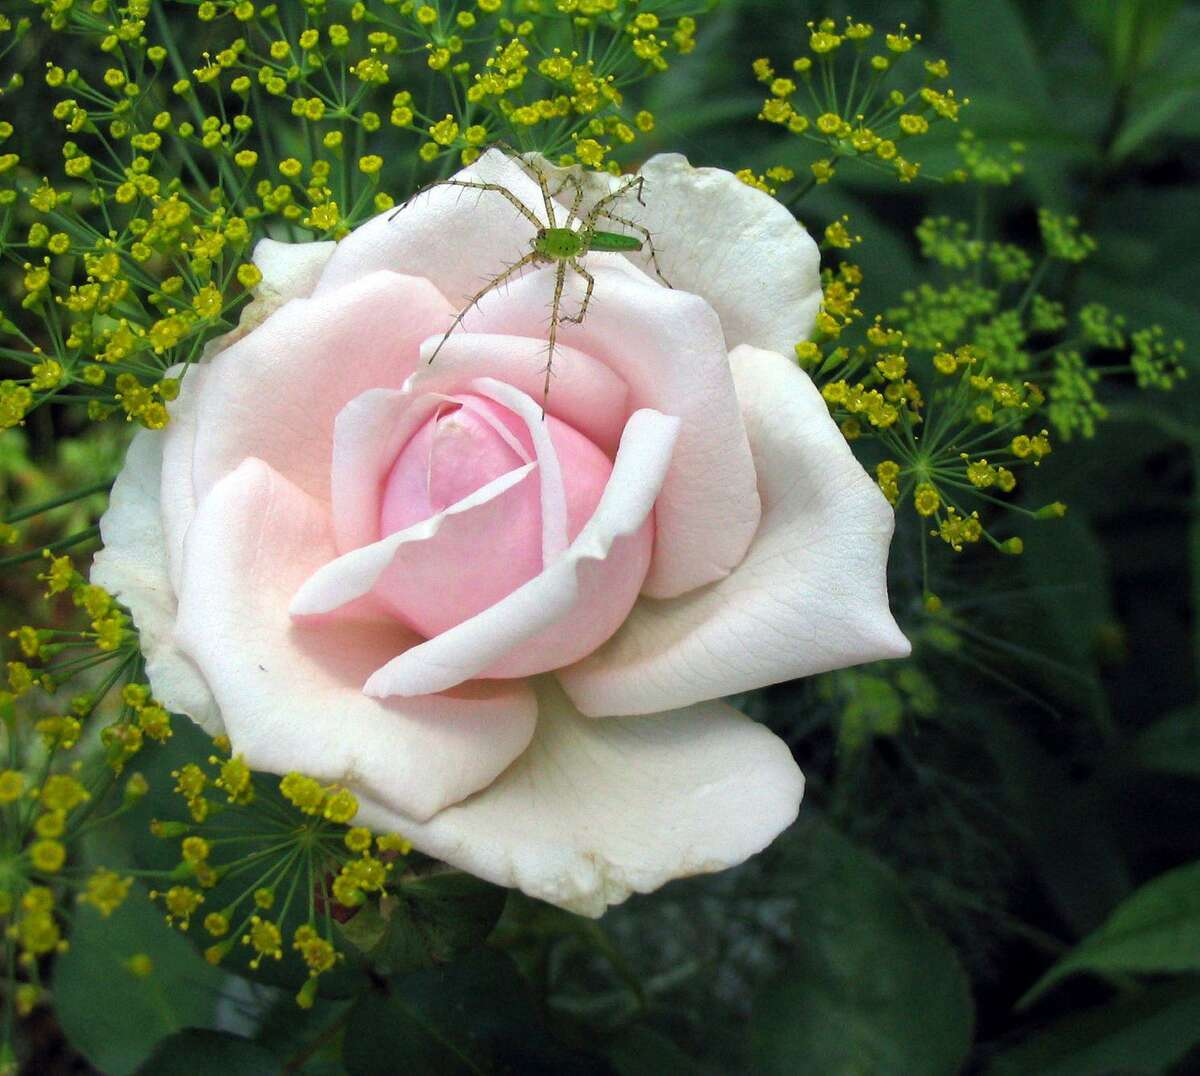 Souvenir de la Malmaison is a small Bourbon rose that Josephine grew in her garden at Château de Malmaison in France. The rose was created in 1843.